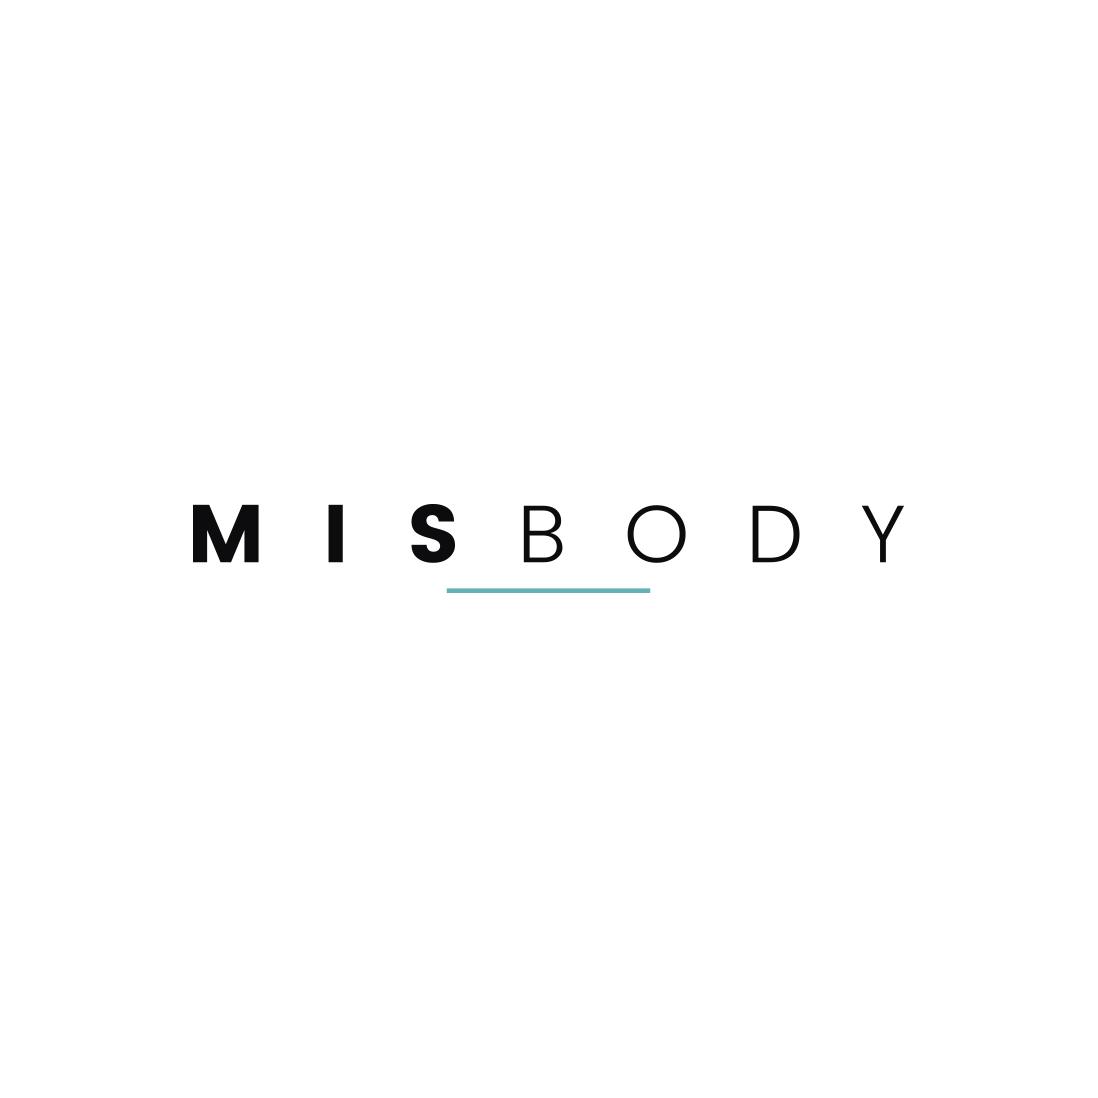 logo-misbody-link